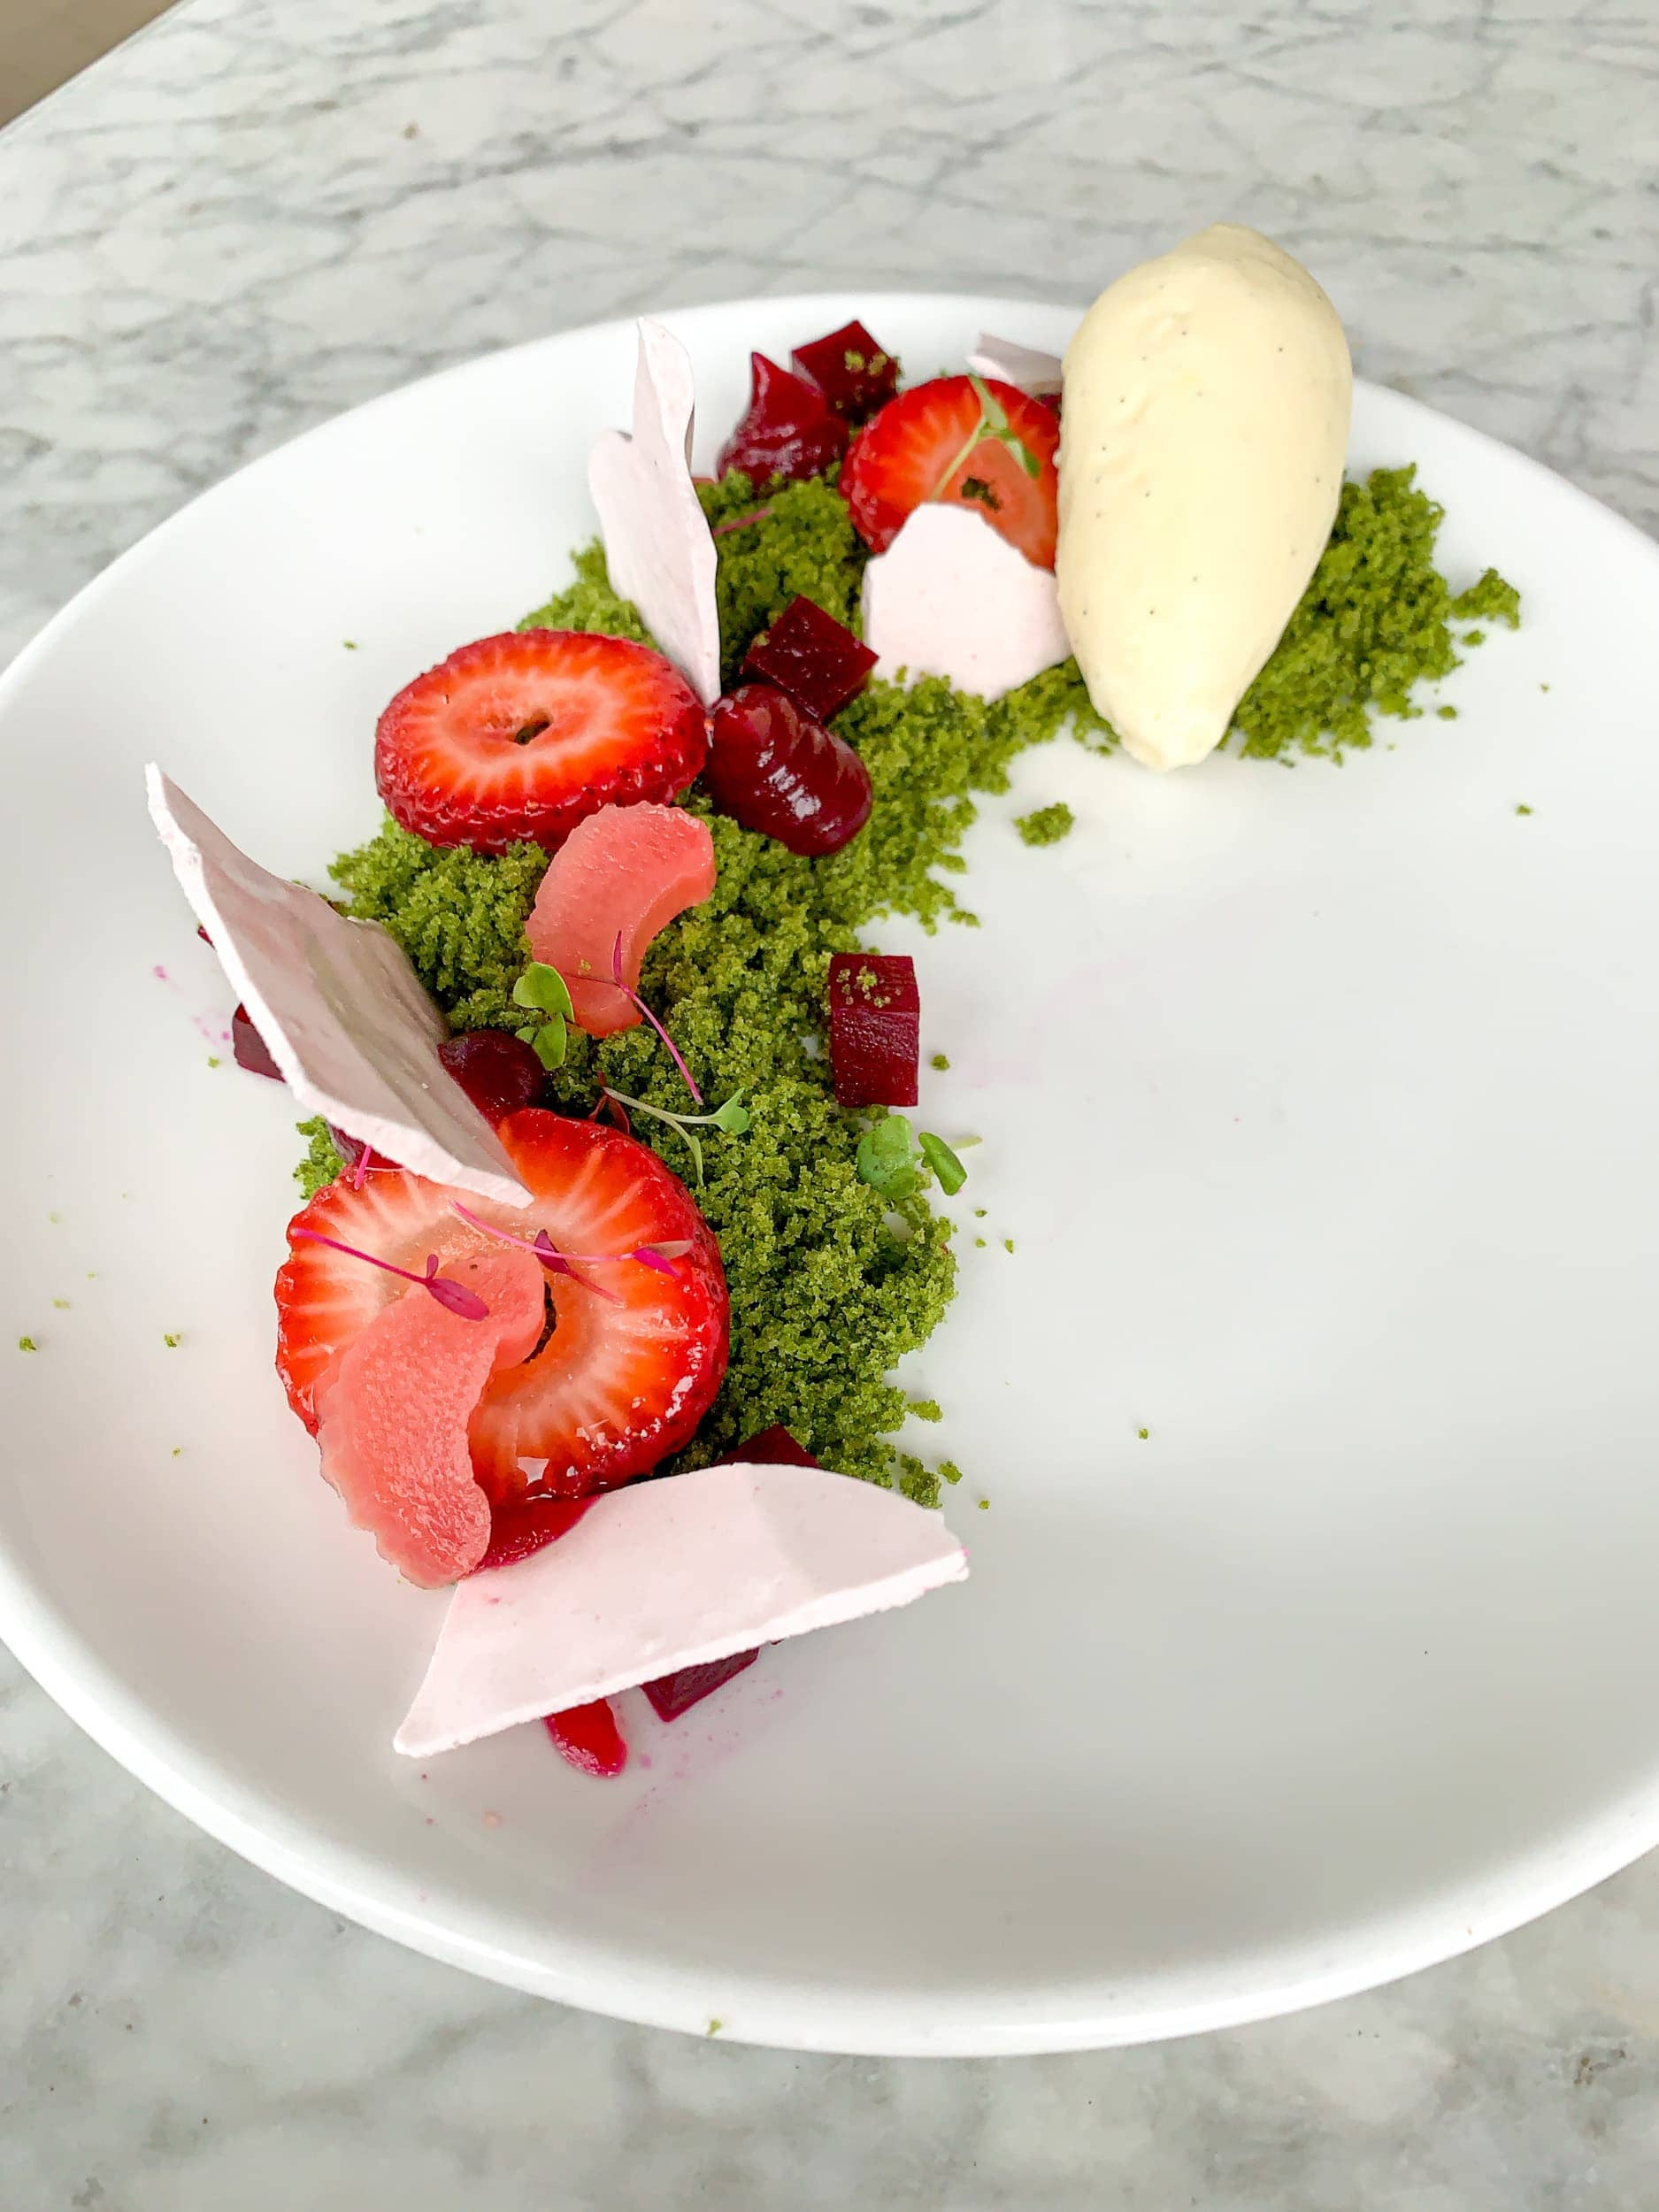 Arugula cake with strawberry, beet, basil, spirulina, and Tahitian vanilla ice cream